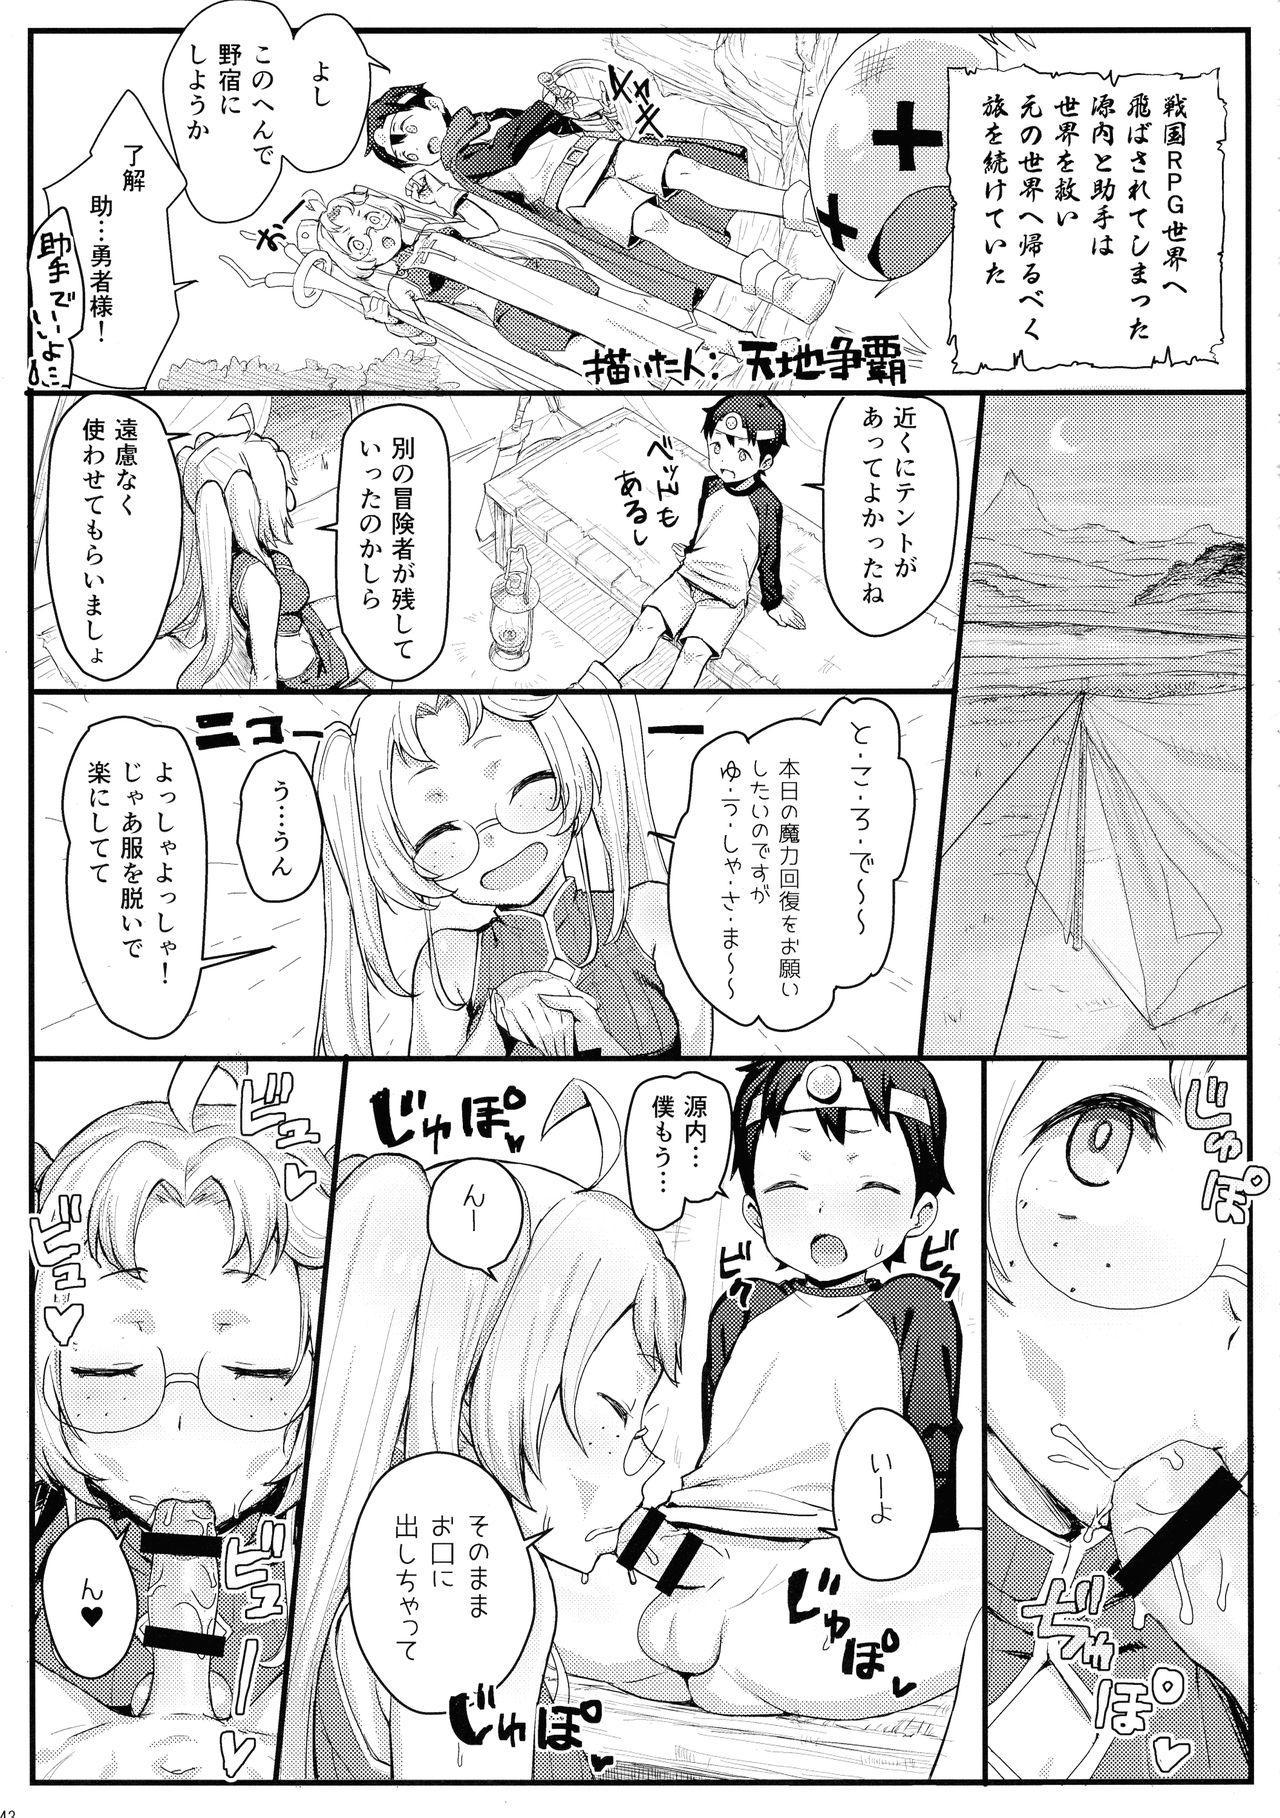 Muhou!! Hiraga Gennai-chan Ecchi Goudoushi 42